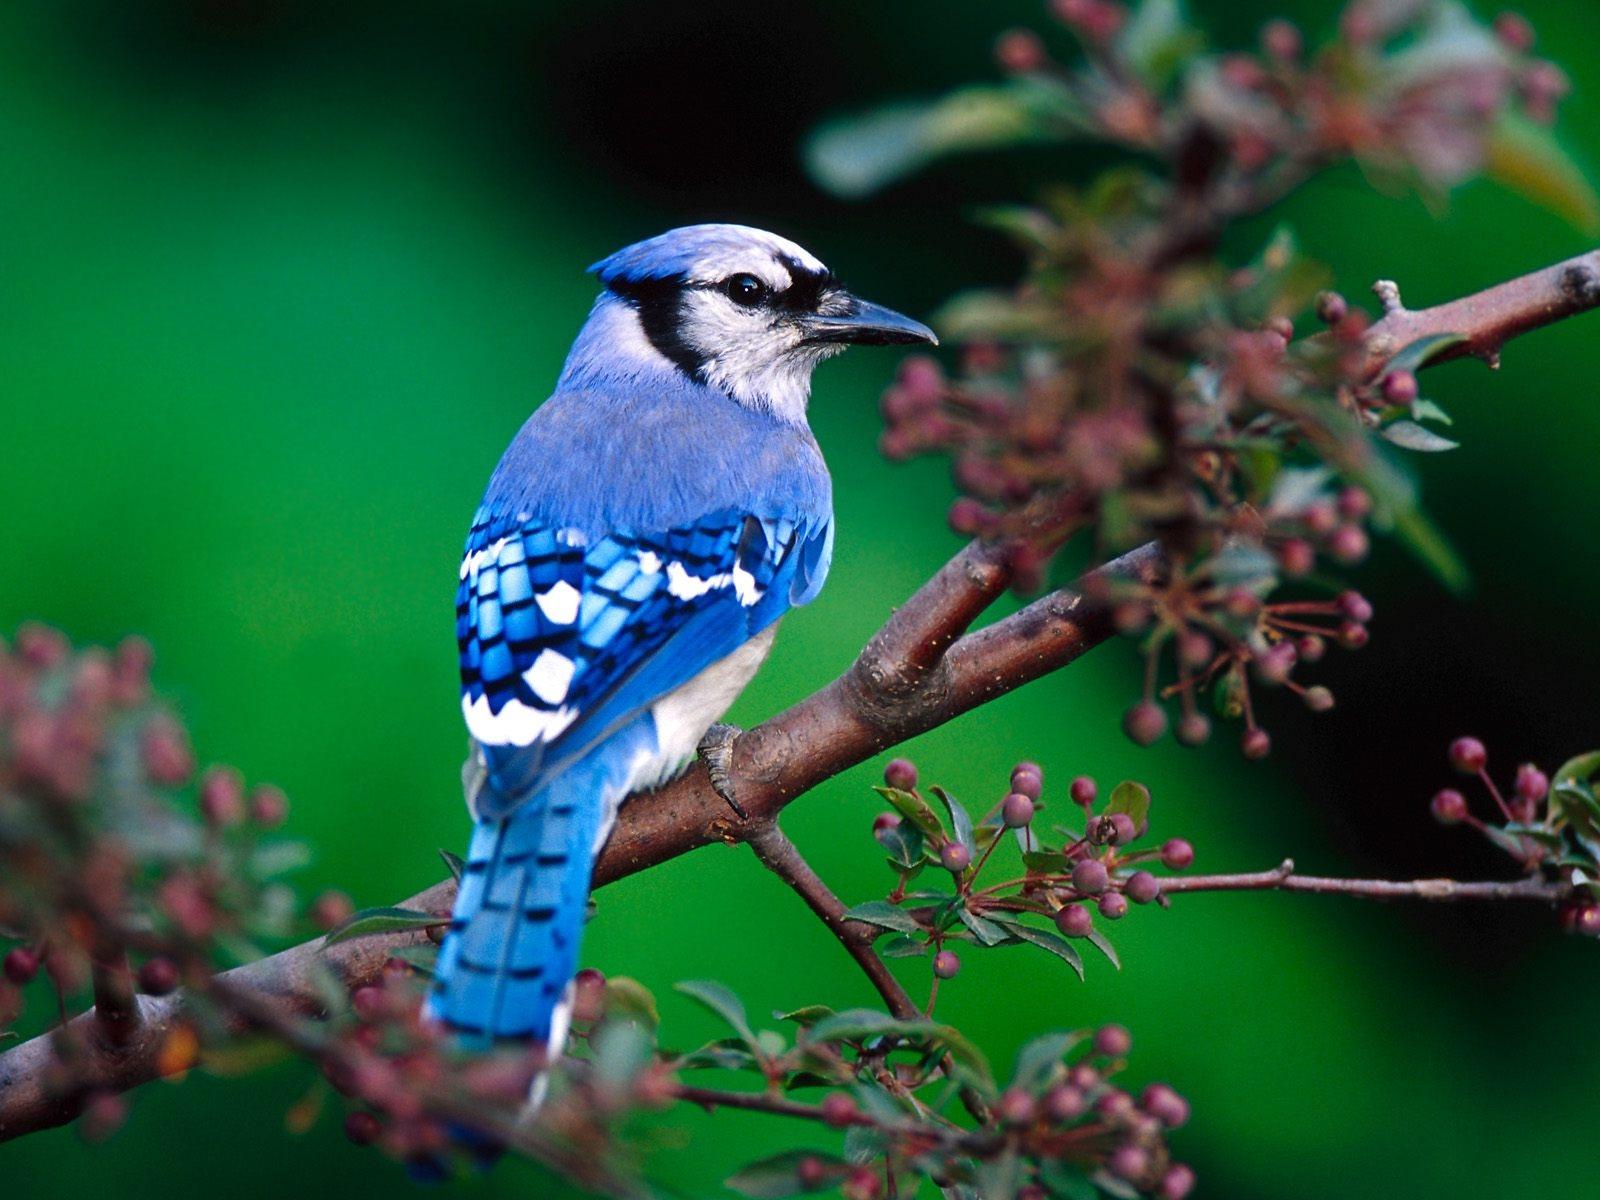 Blue Bird Wallpaper Share On Whats app   Images Photos 1600x1200